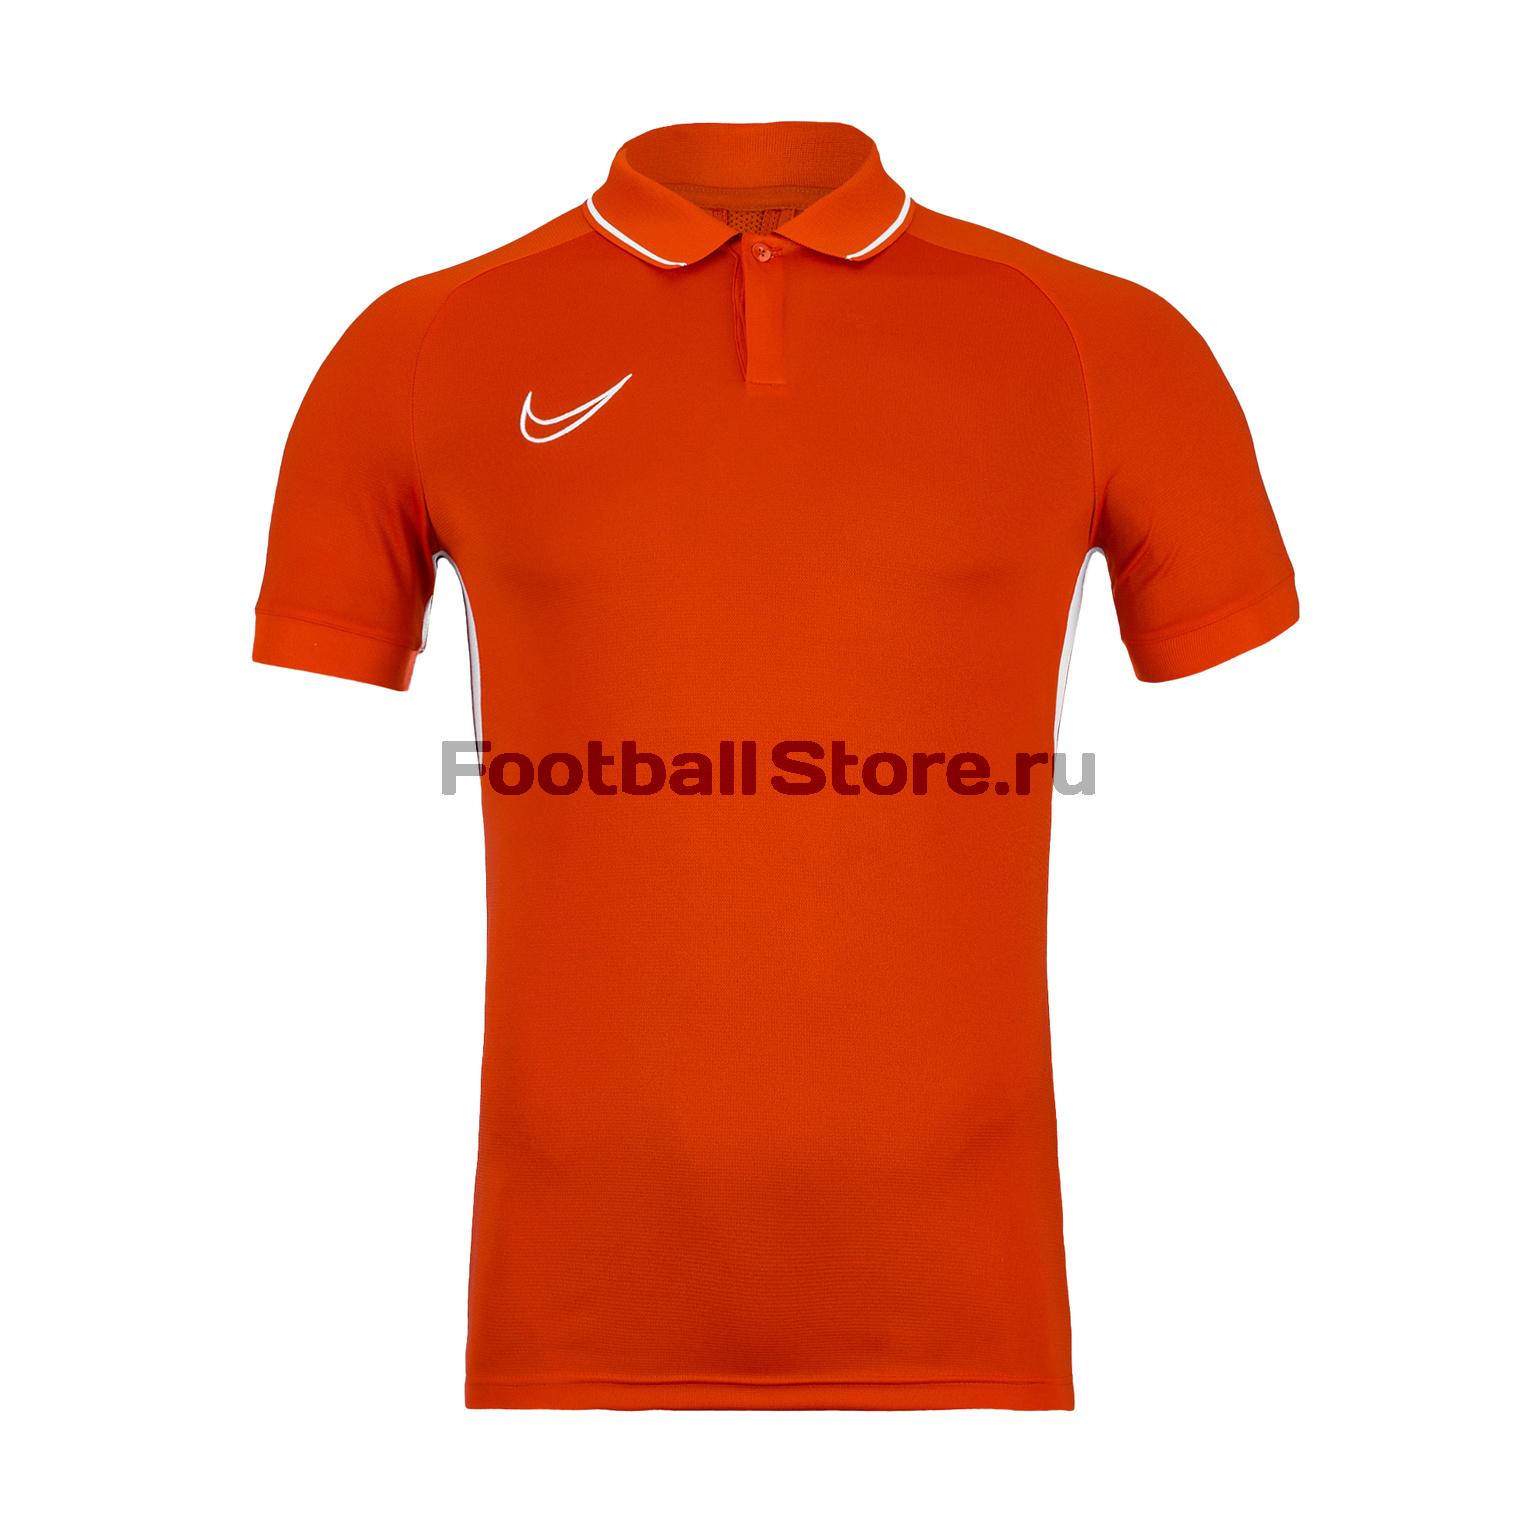 Поло Nike Dry Academy19 Polo BQ1496-657